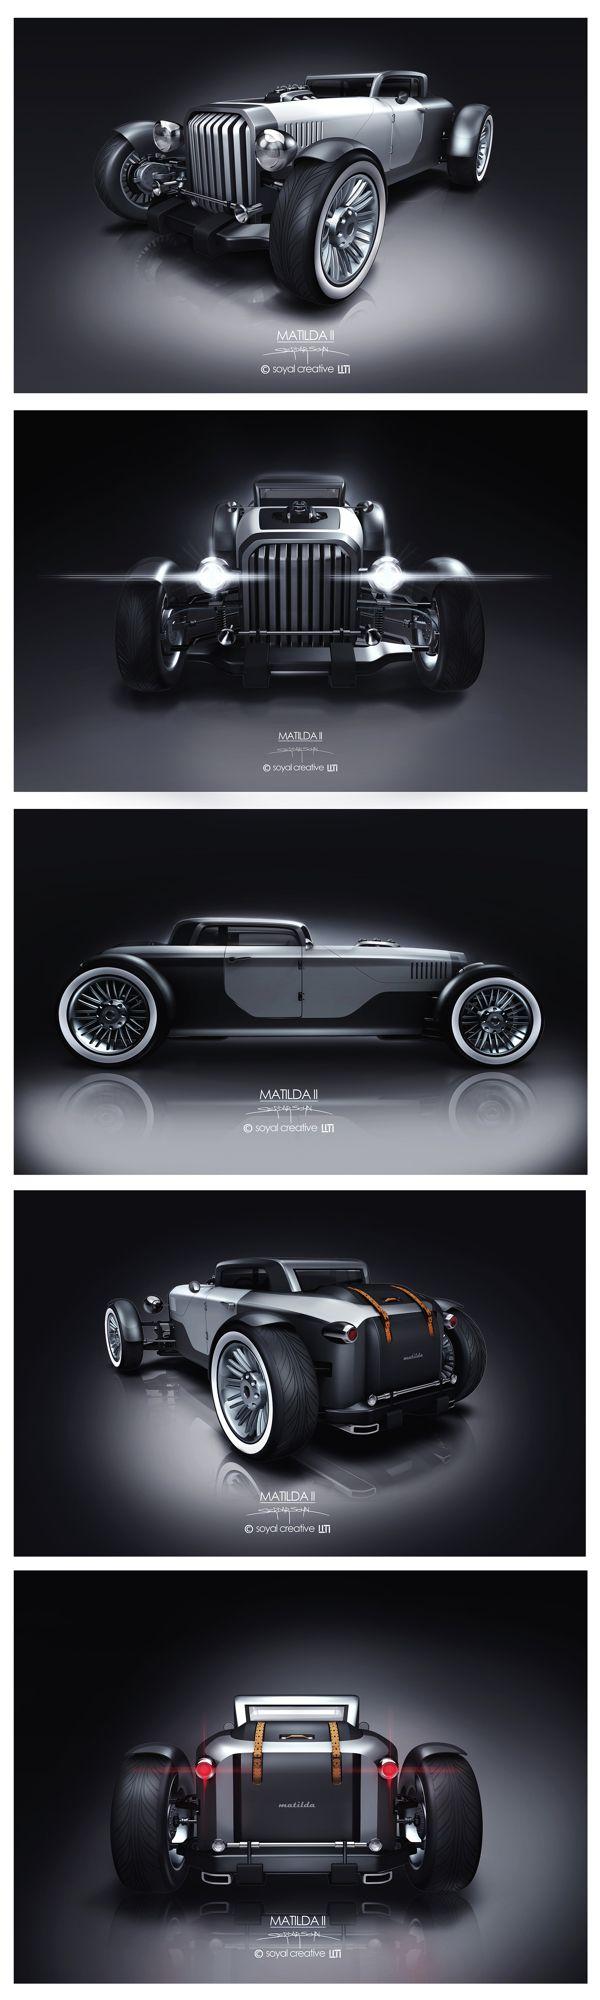 200+ ideas for my new Street Rod - Matilda II by Serdar Soyal, via Behance